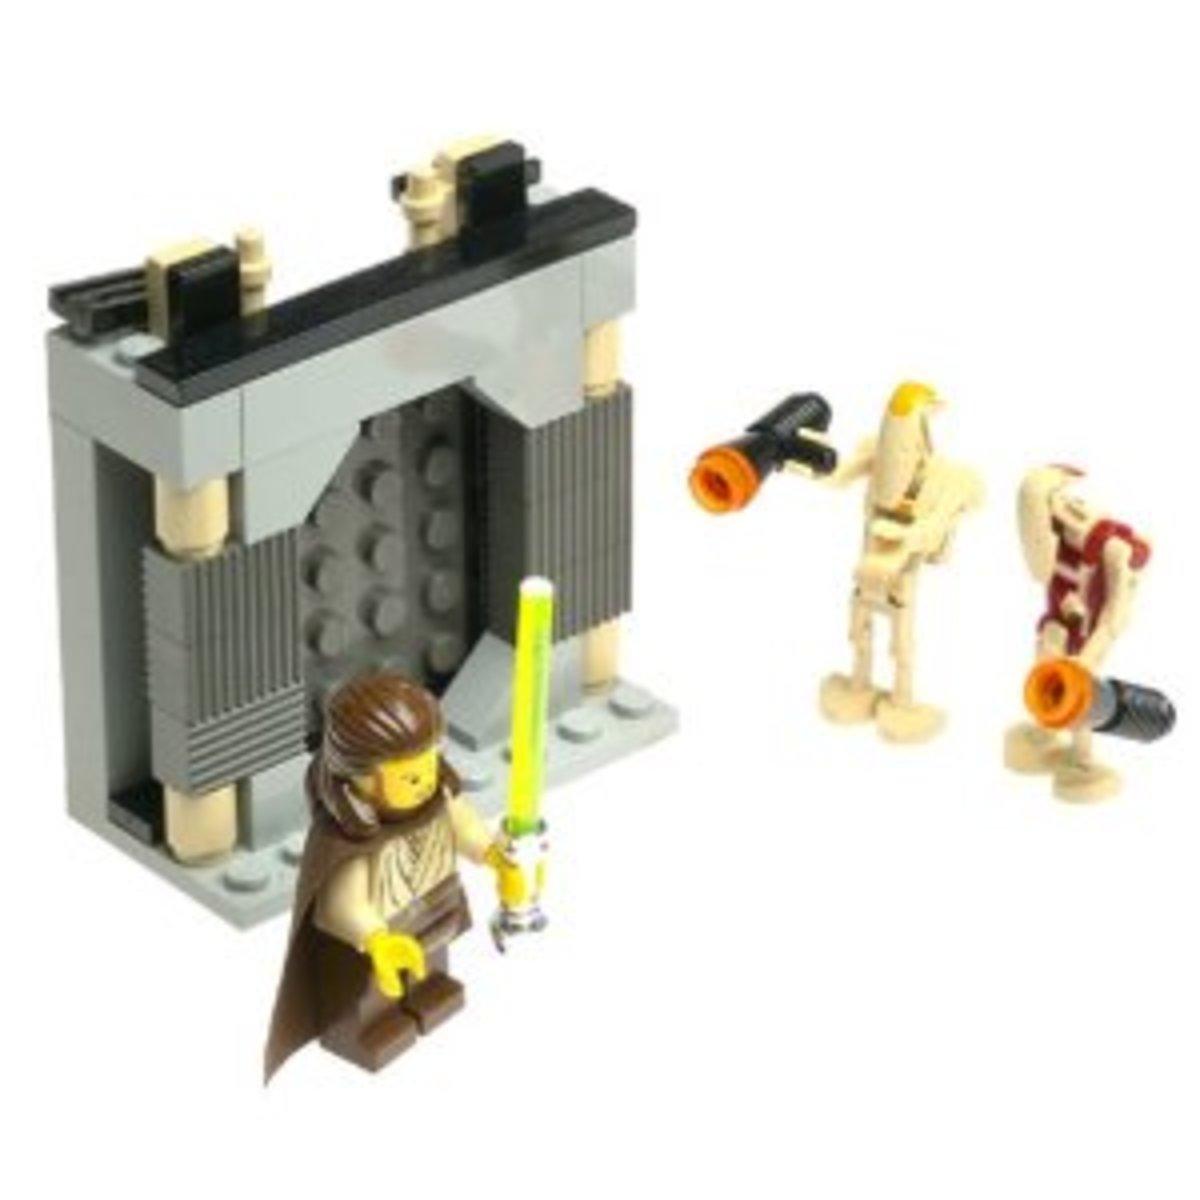 LEGO Star Wars Jedi Defense 2 7204 Assembled